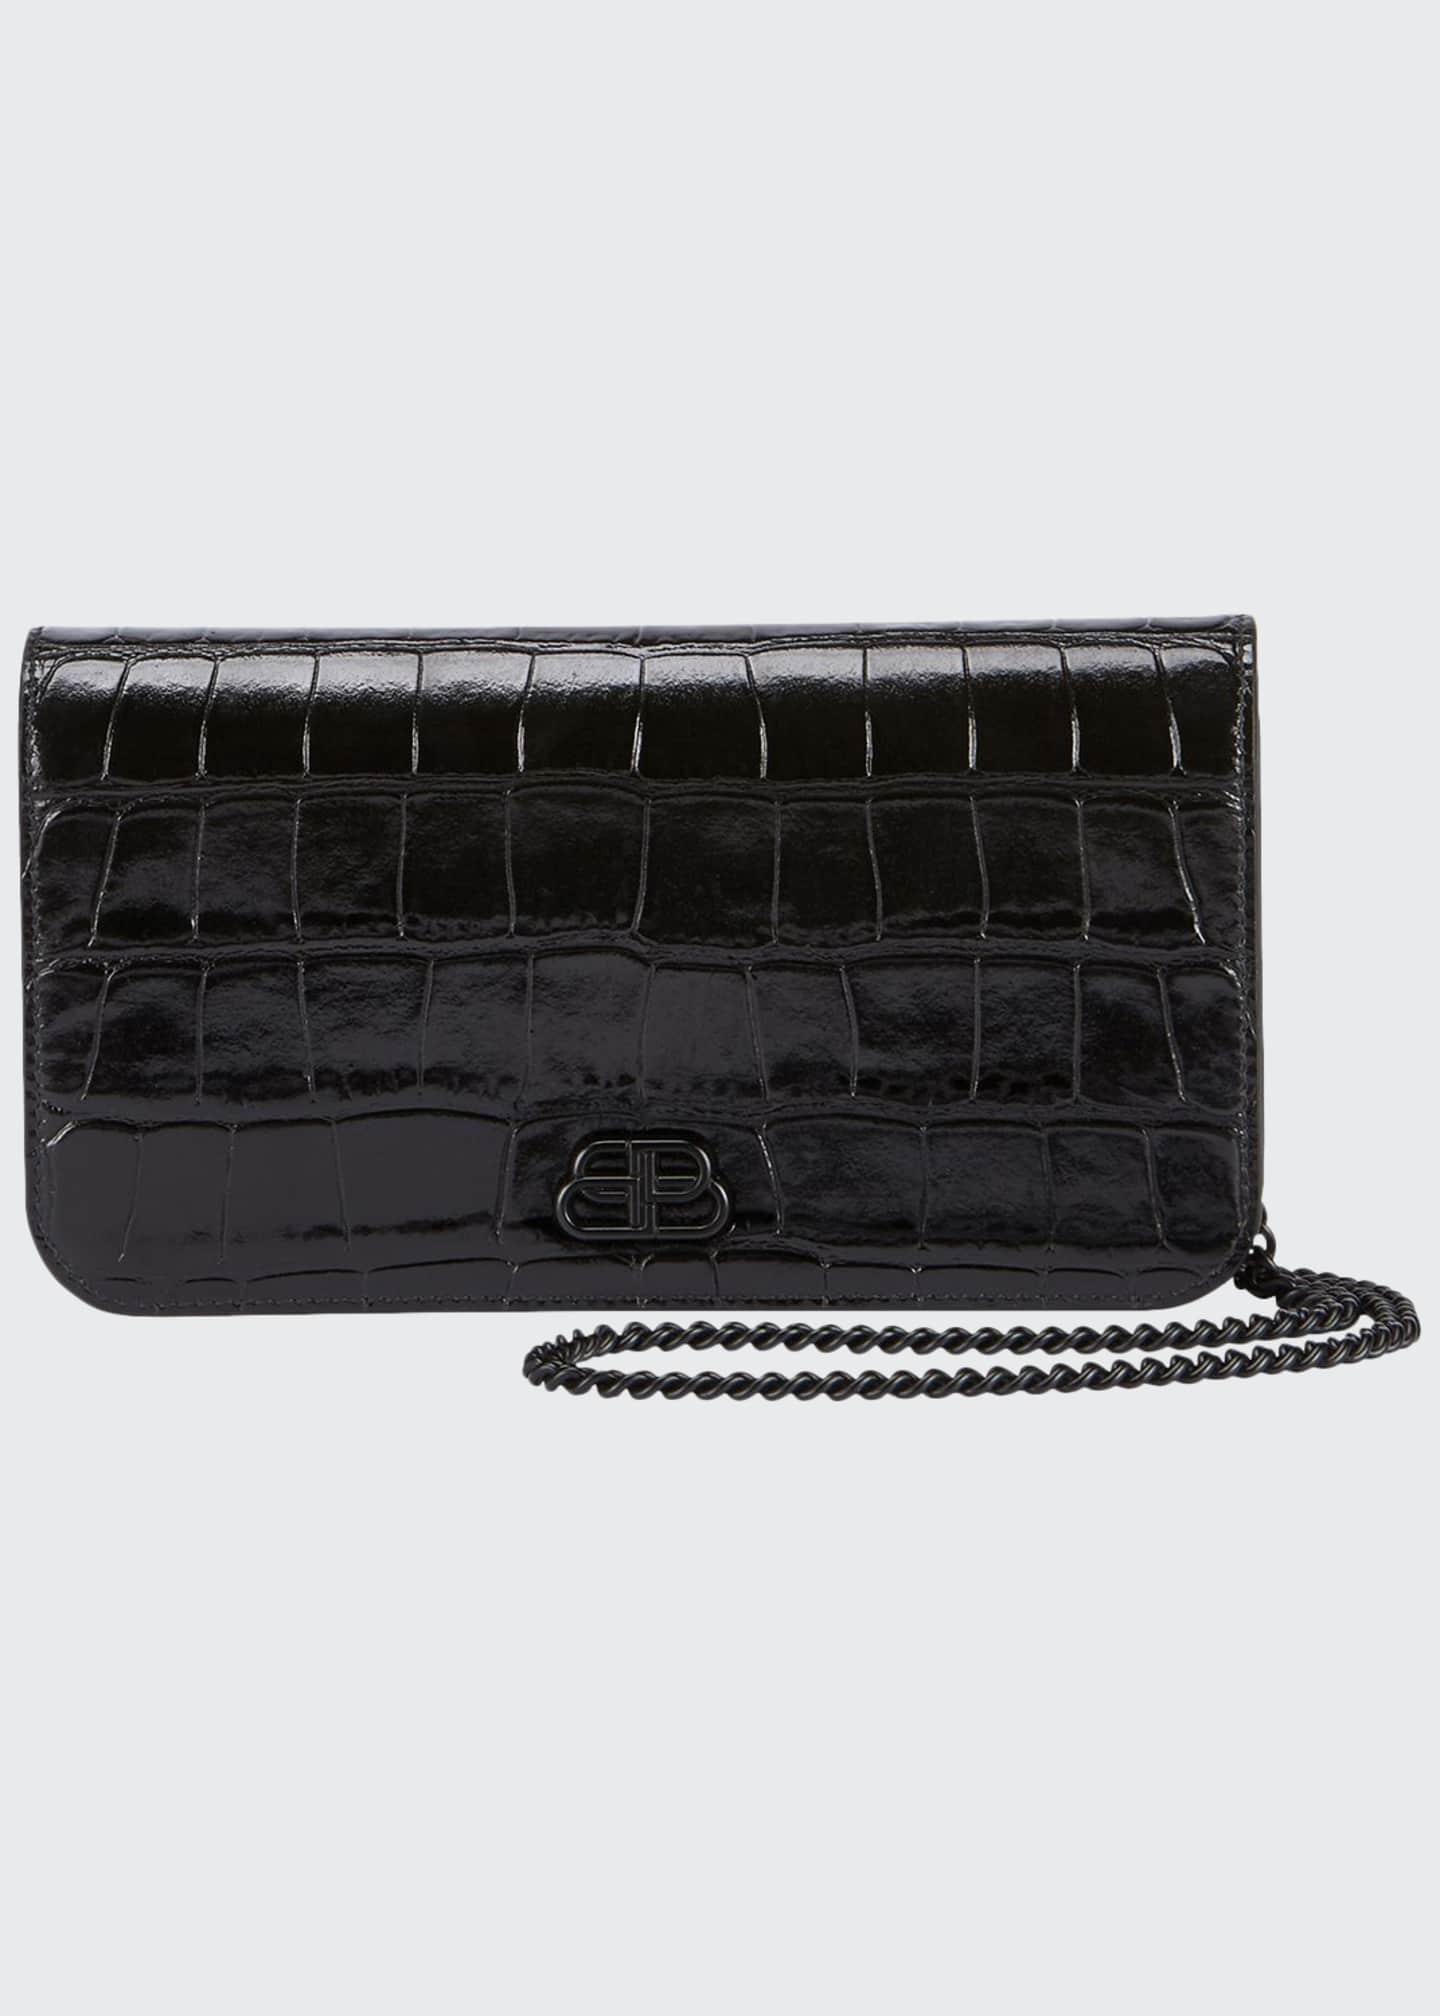 Balenciaga Cash Phone Shiny Wallet on Chain